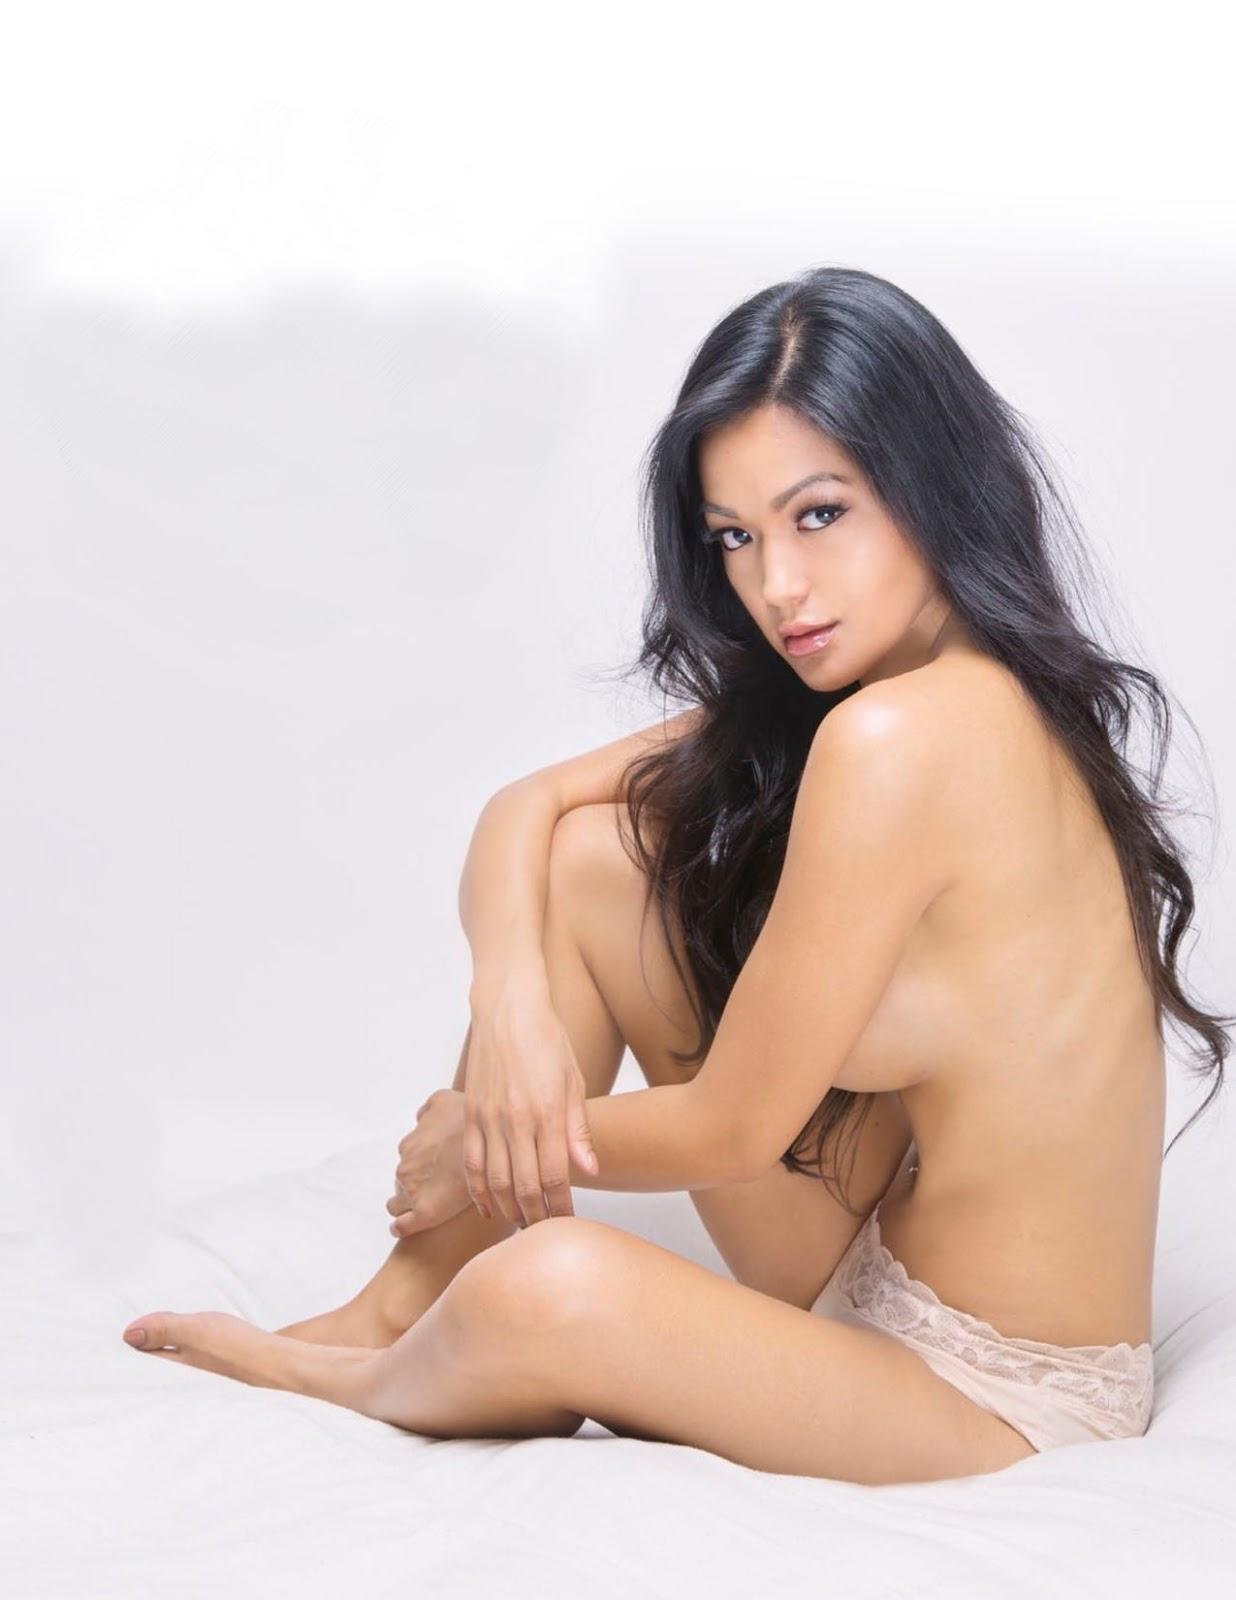 Fhm philippines boobs